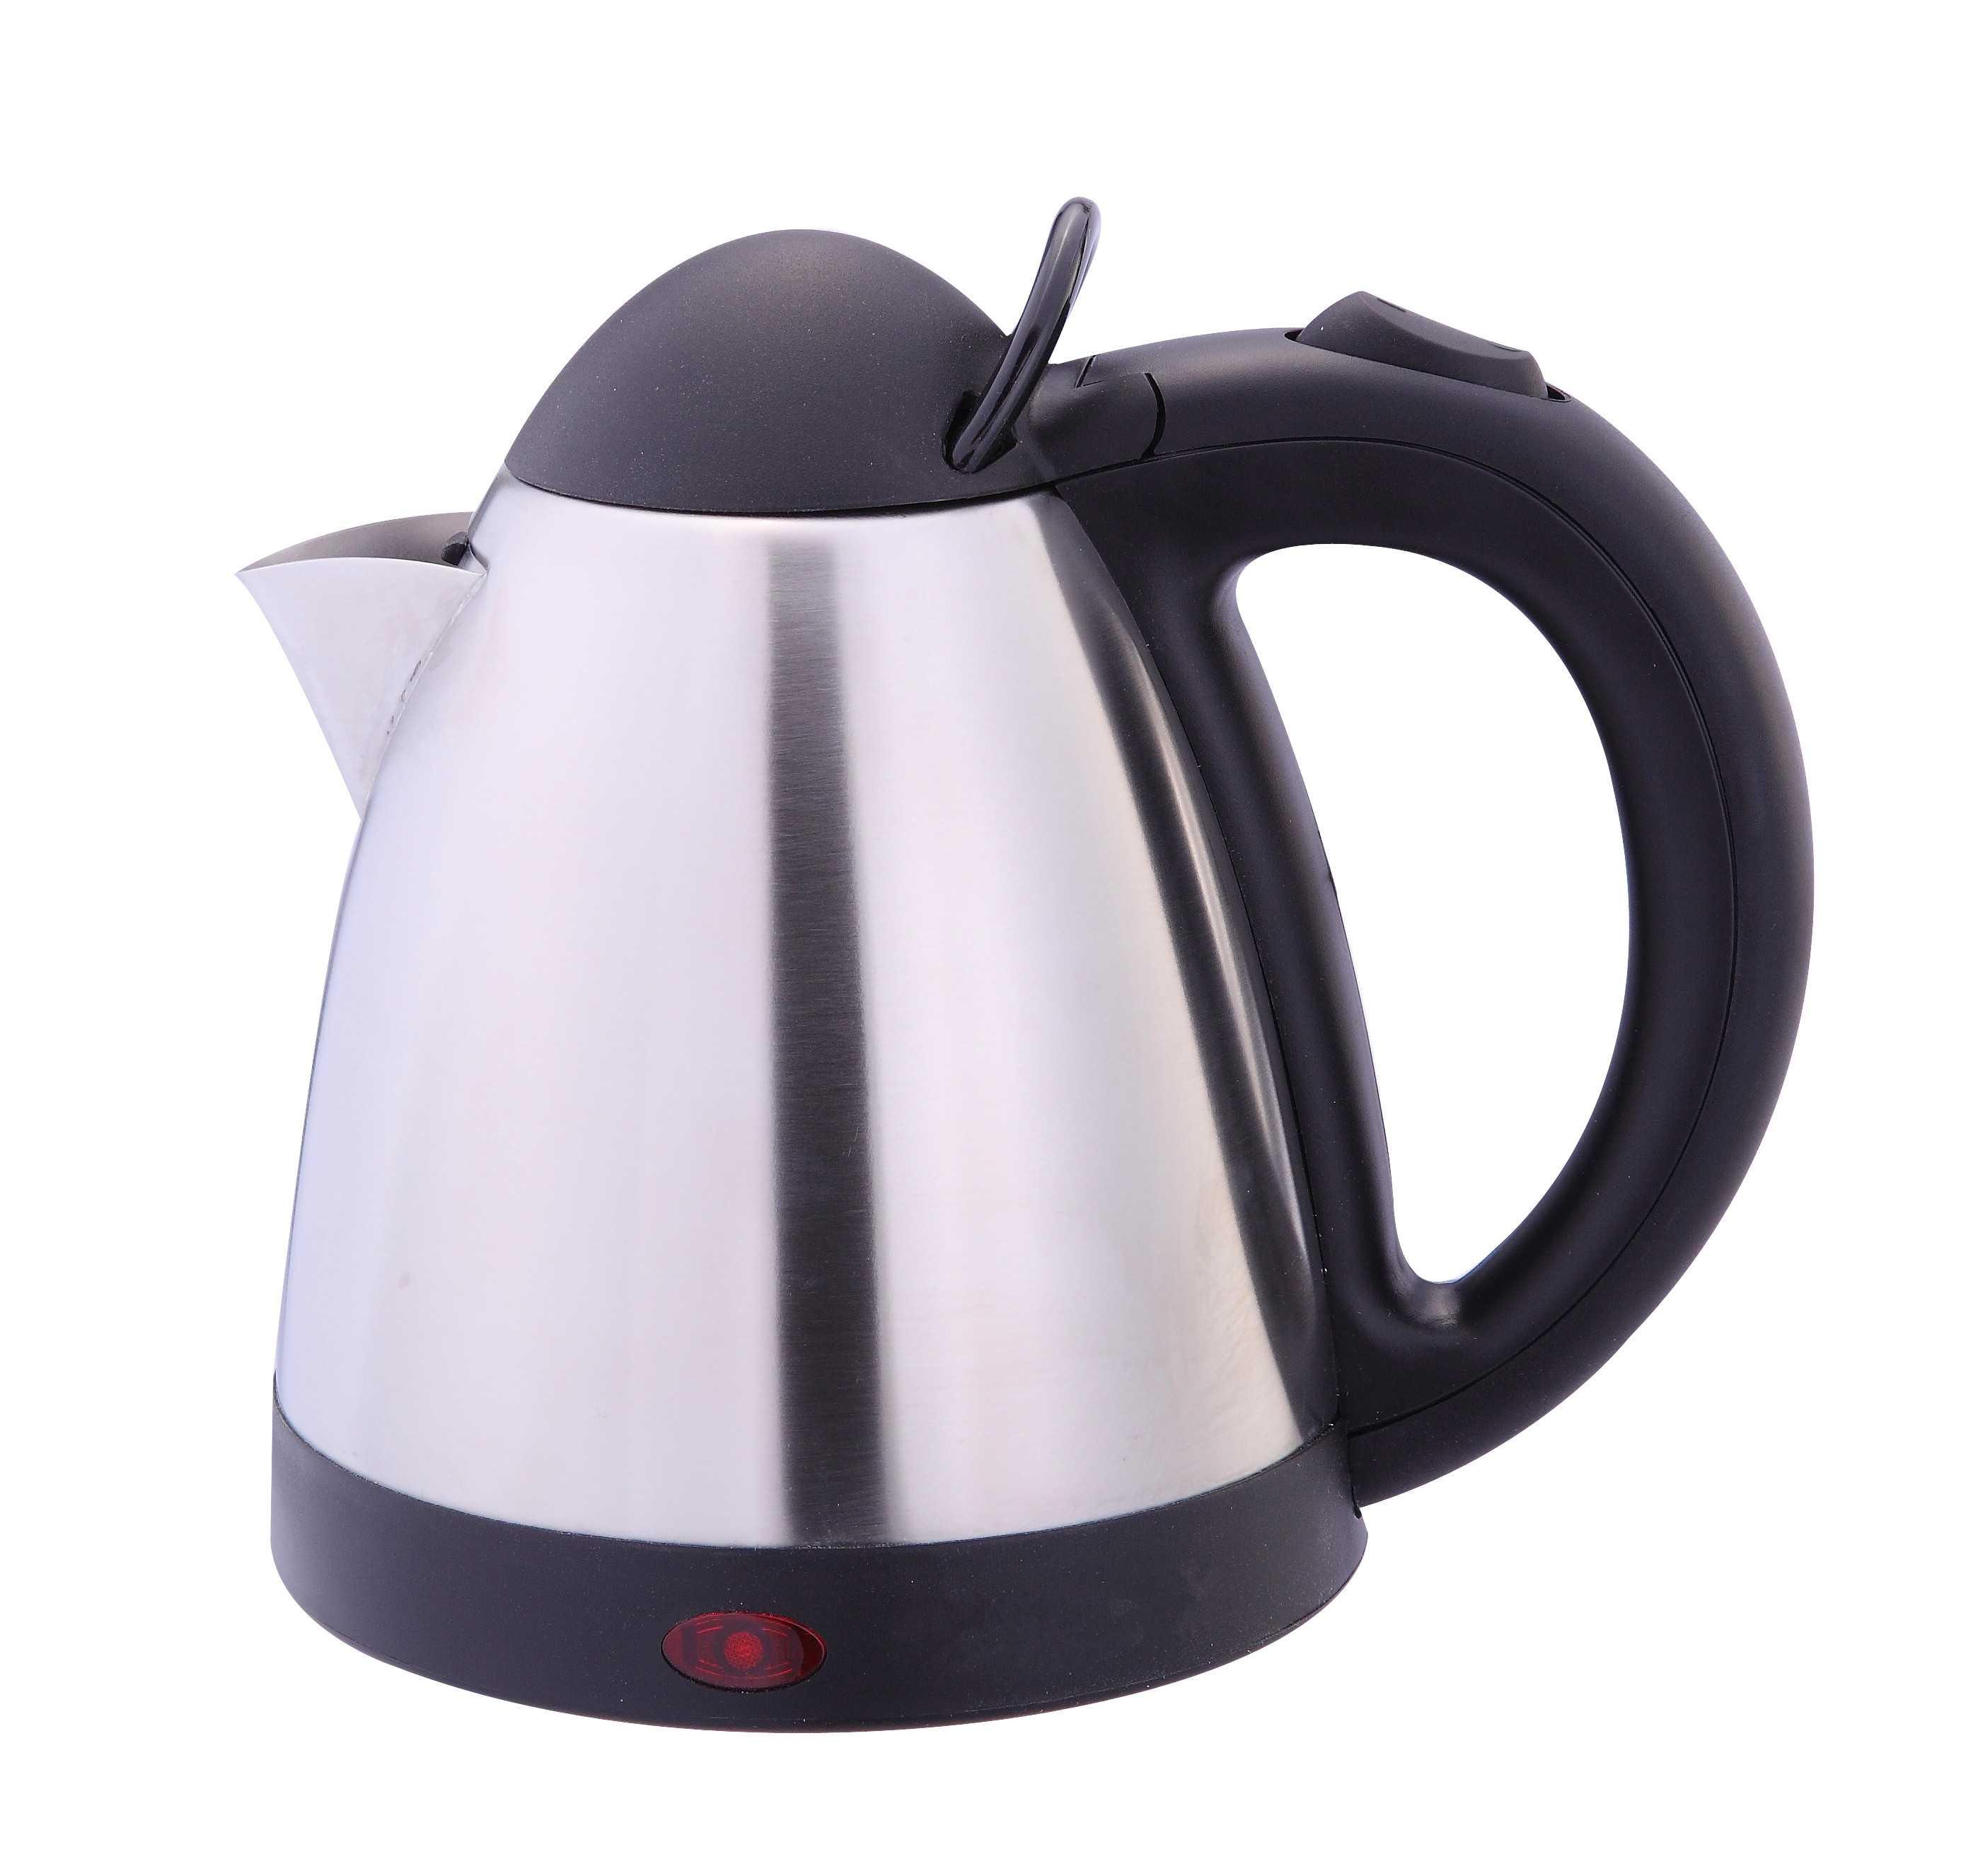 Name:Electric kettles   Model:AL3303